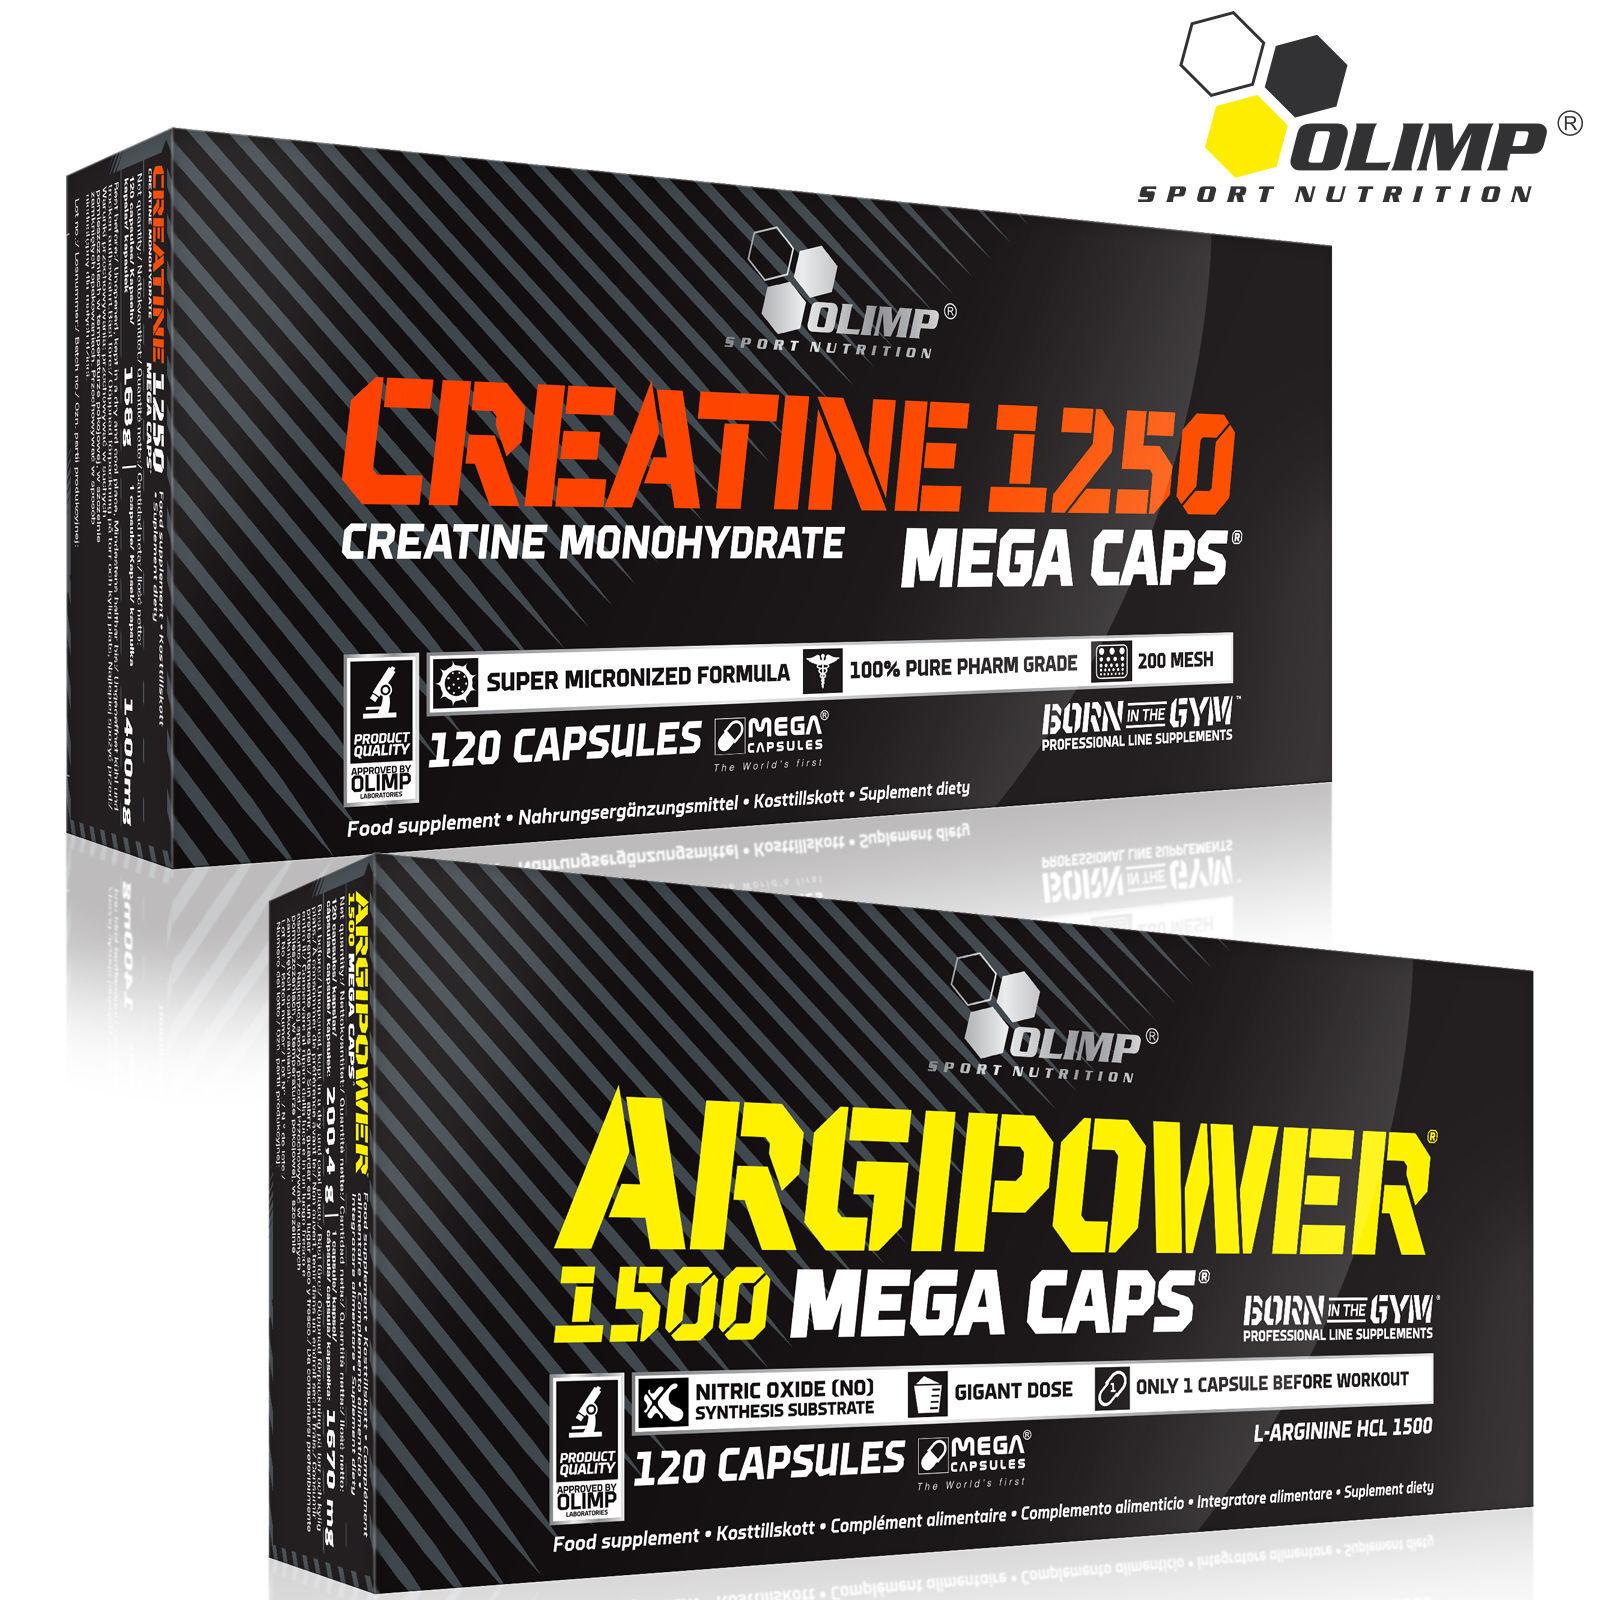 Creatine Monohydrate + Argipower L-Arginine Preworkout Capsules Nitric Oxide  1